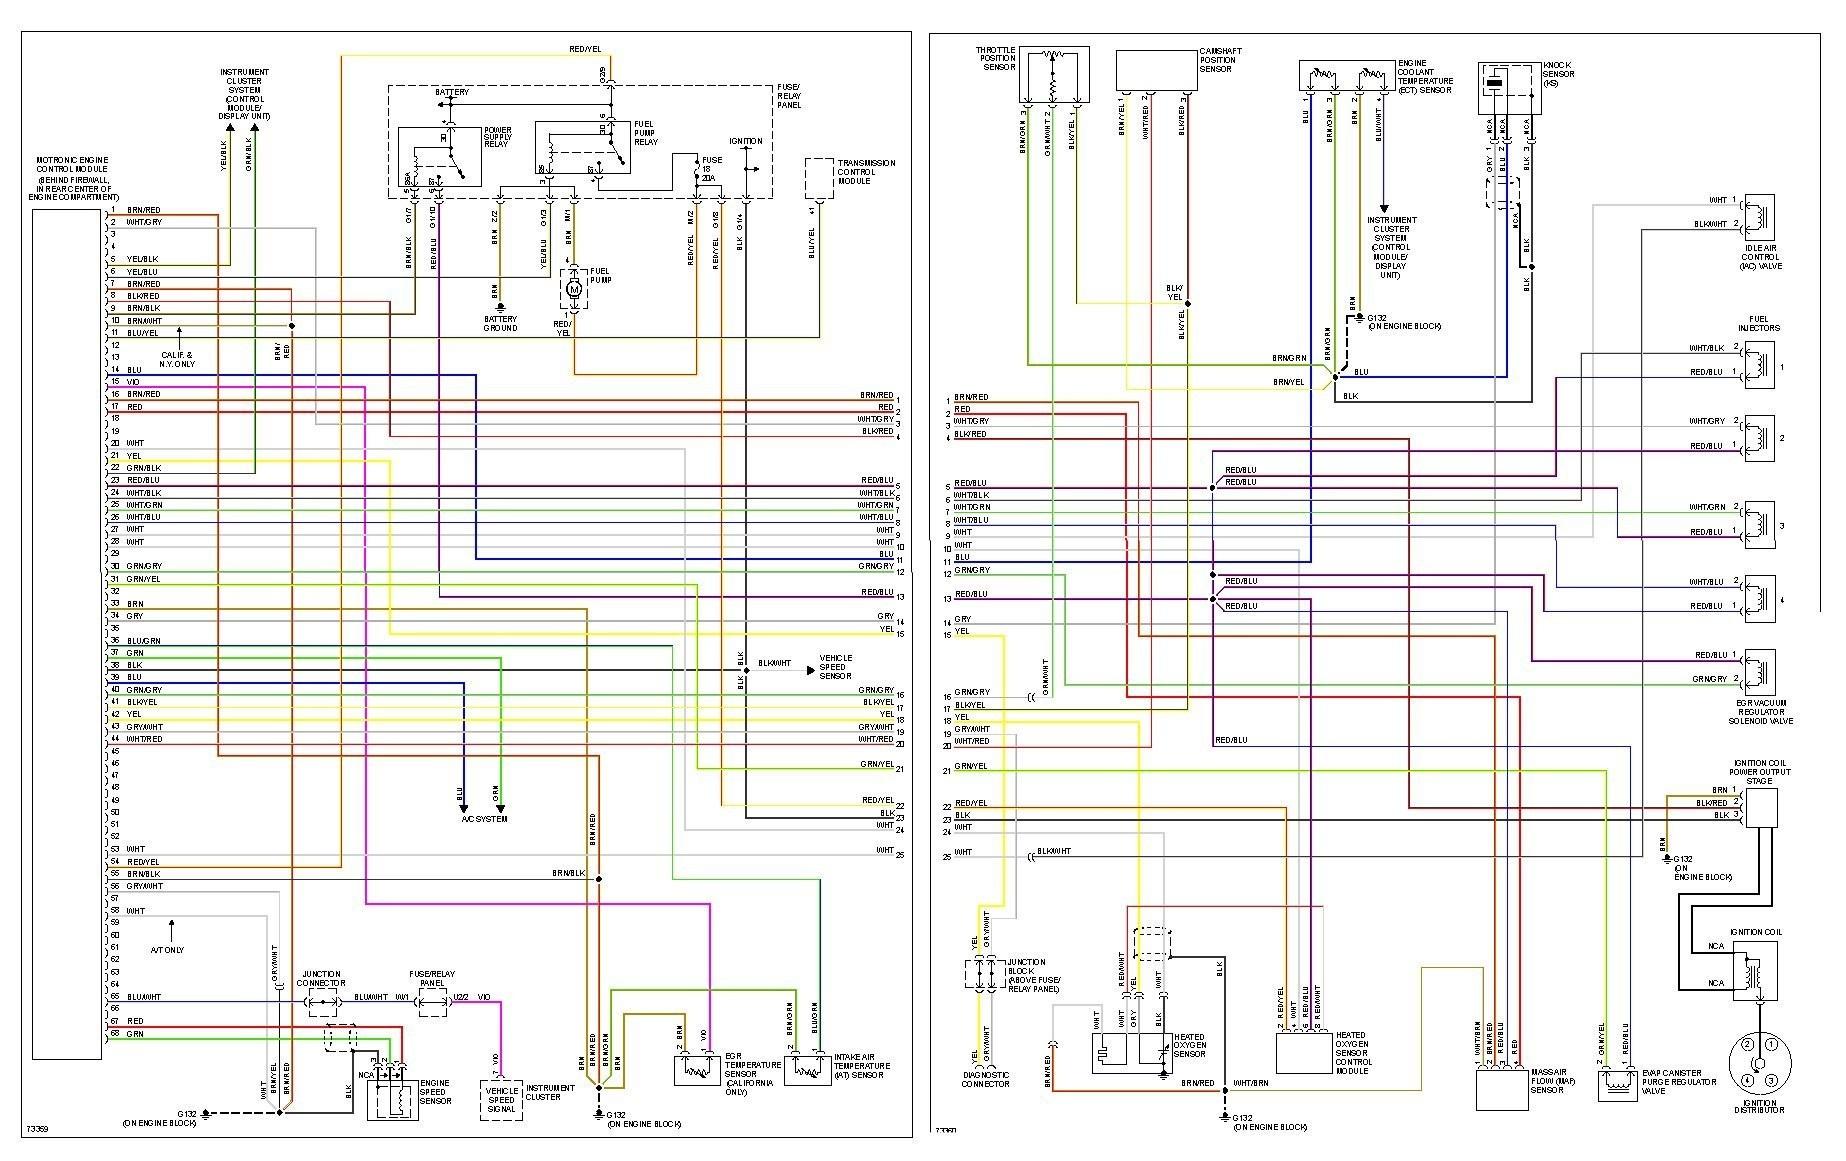 2002 jetta monsoon wiring diagram lawn mower key switch vw engine my